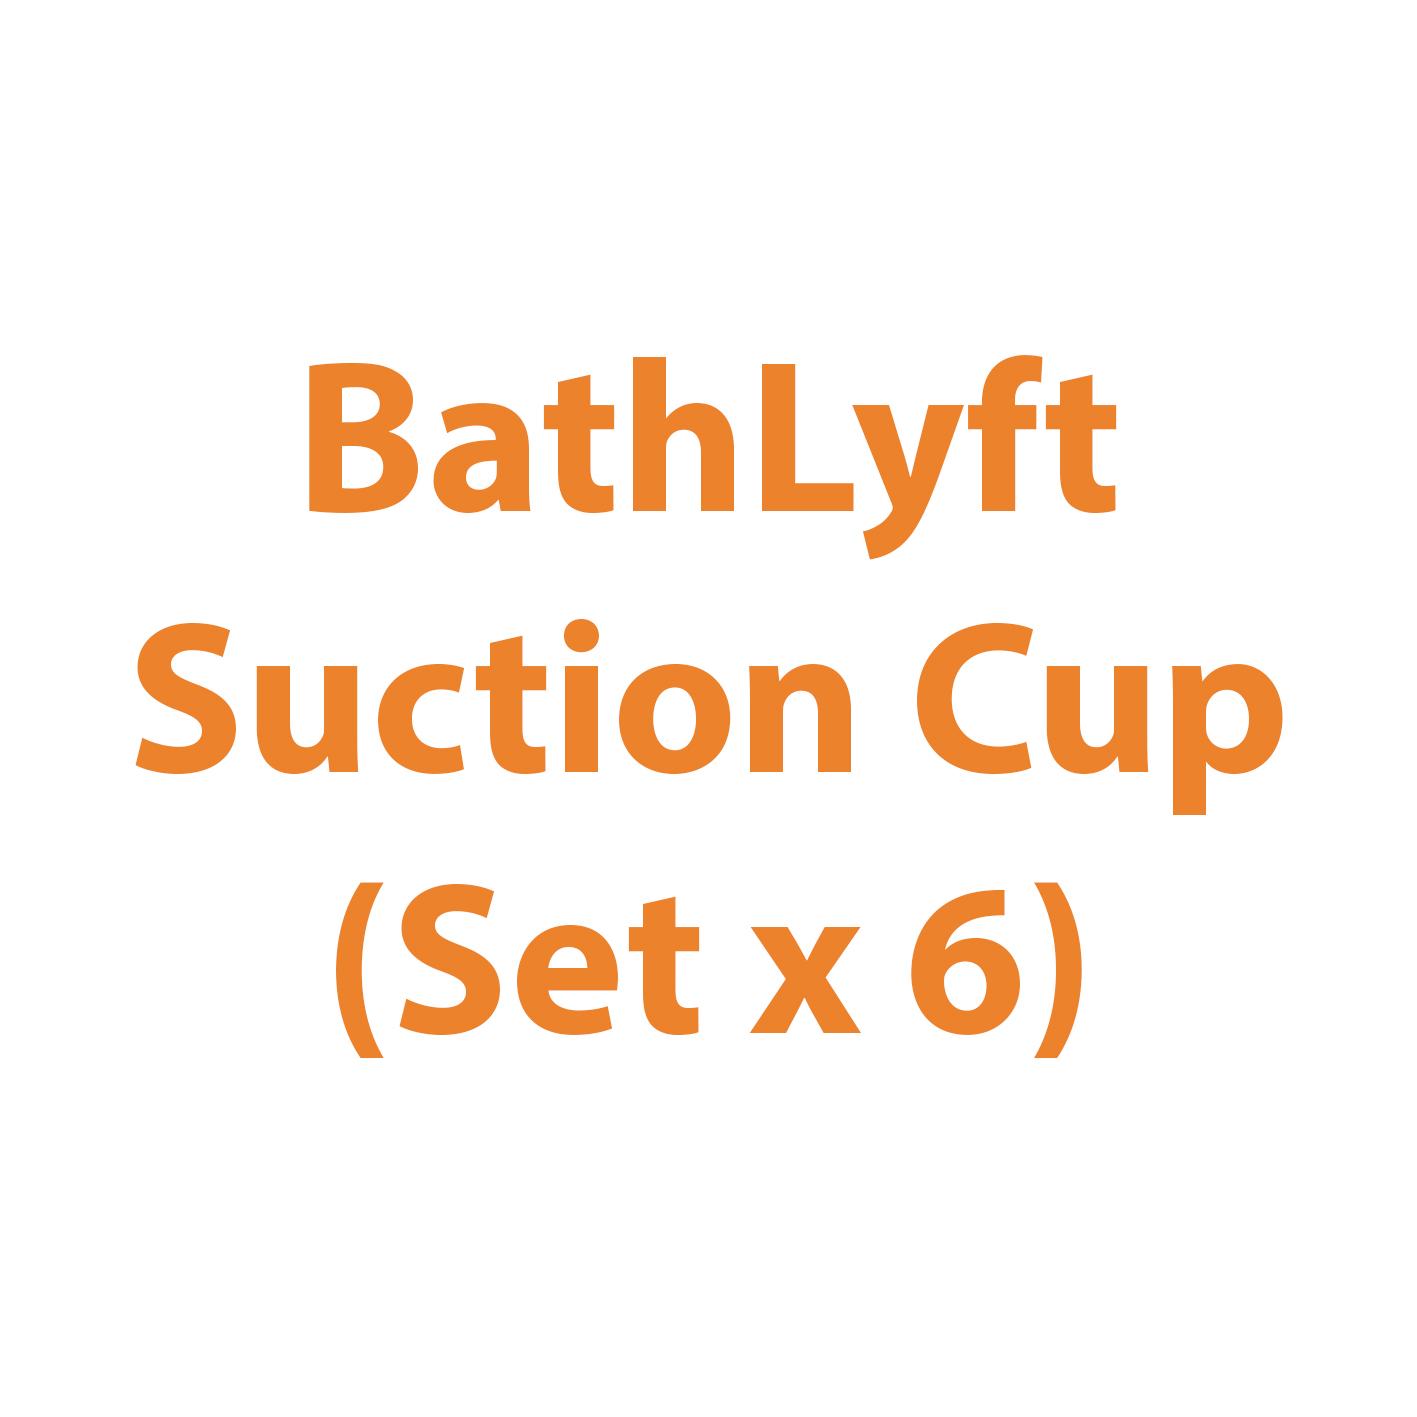 BathLyft Suction Cup (Set x 6)   Michigan USA